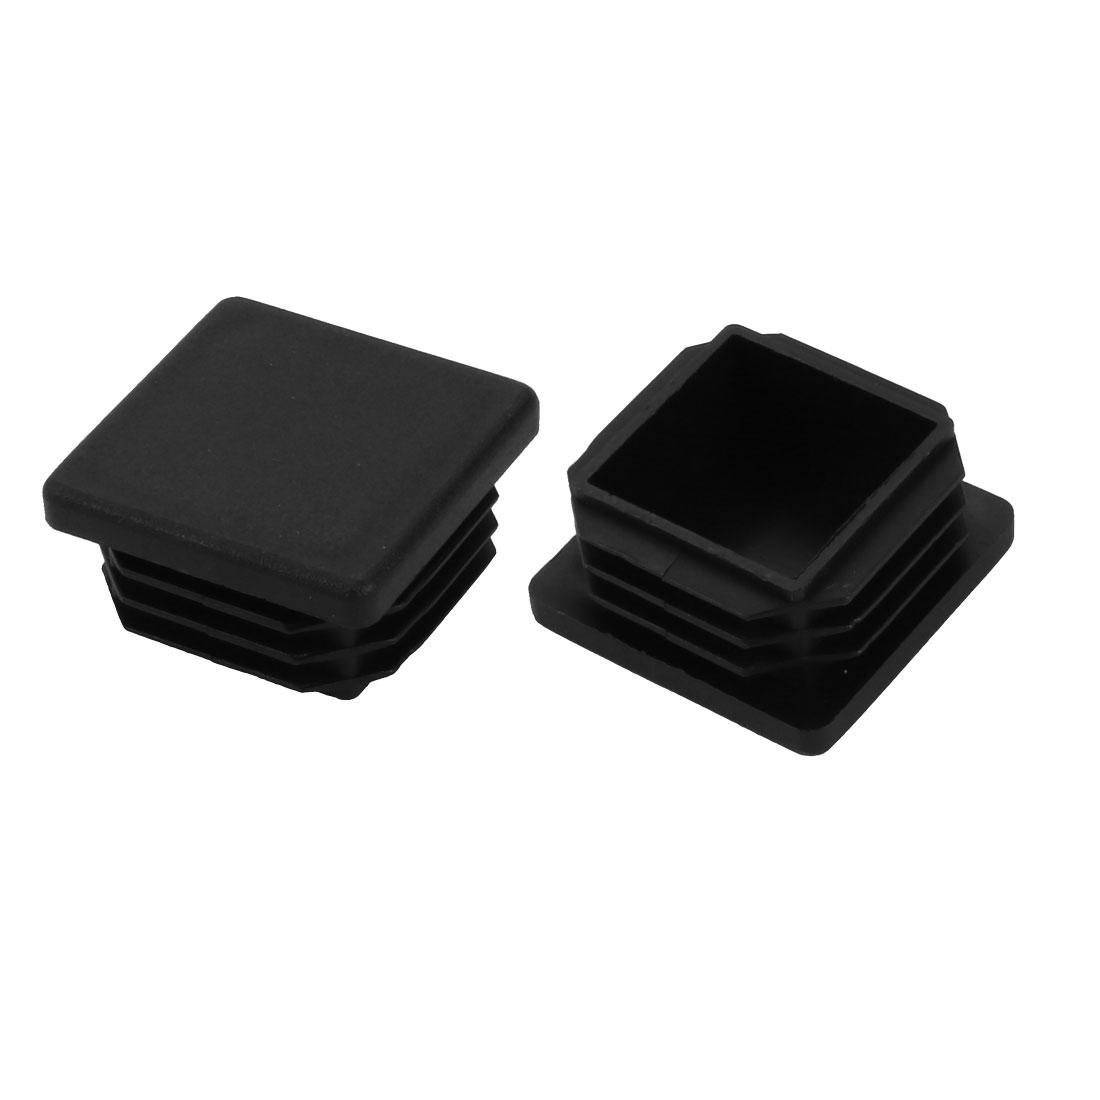 2pcs 30mm x 30mm Pipe Tube Insert Chair Leg Cap Black Plastic Tubing Plug